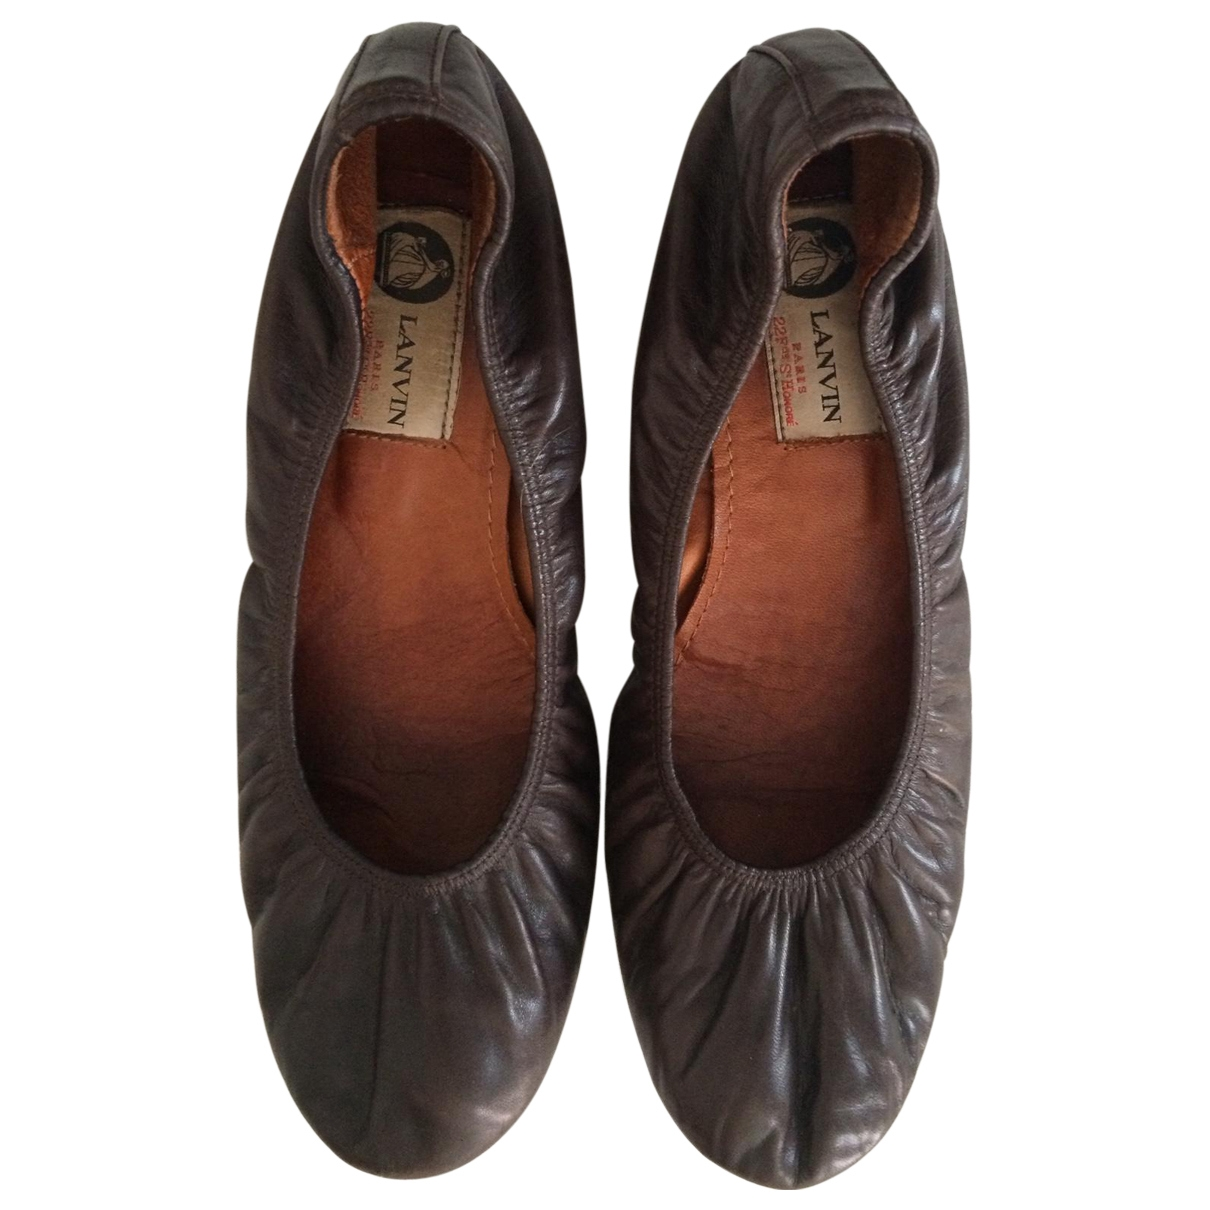 Lanvin \N Brown Leather Ballet flats for Women 37 EU